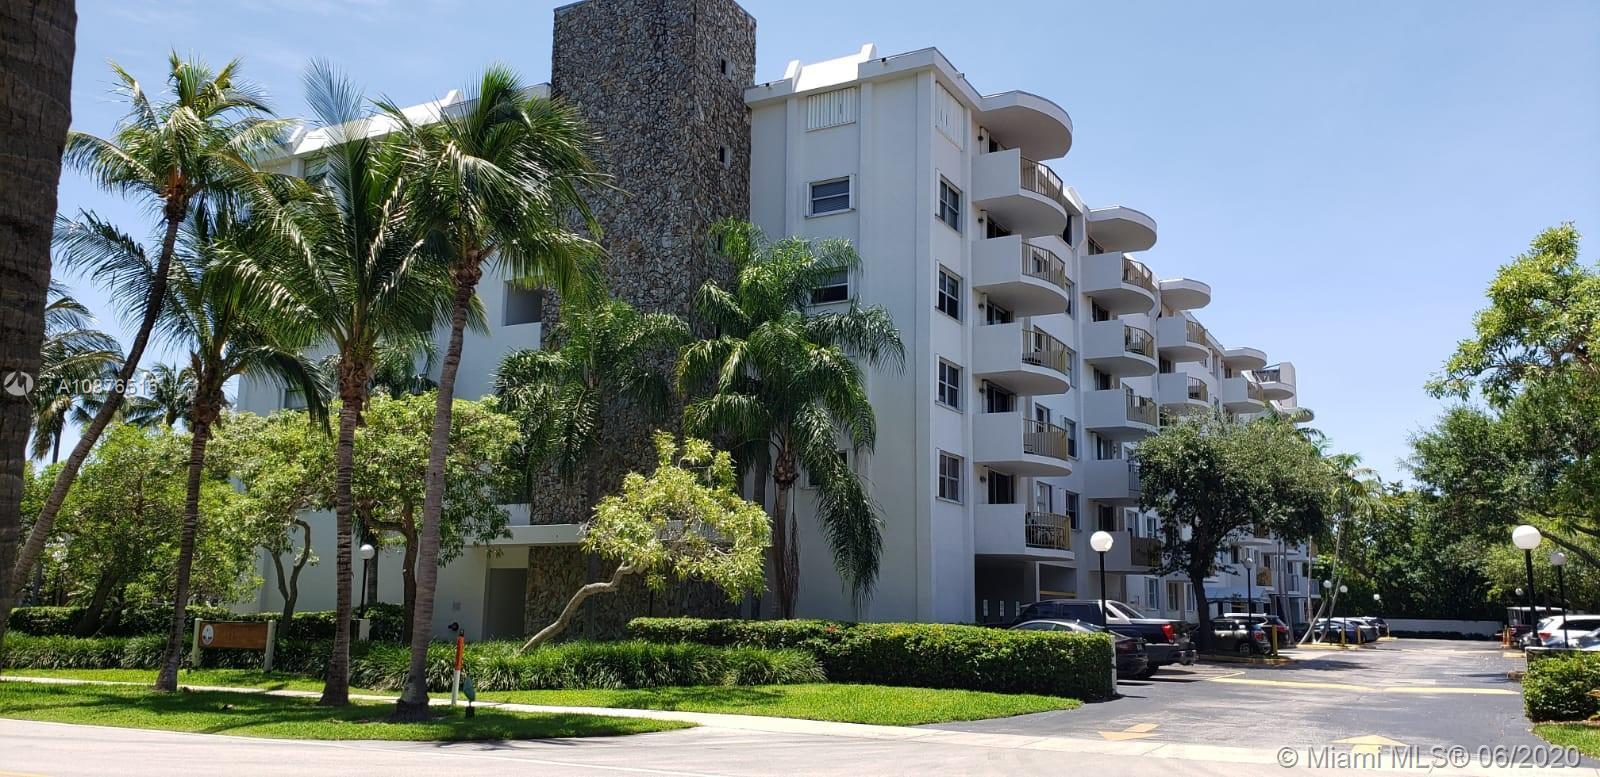 Cape Florida Club #510 - 01 - photo